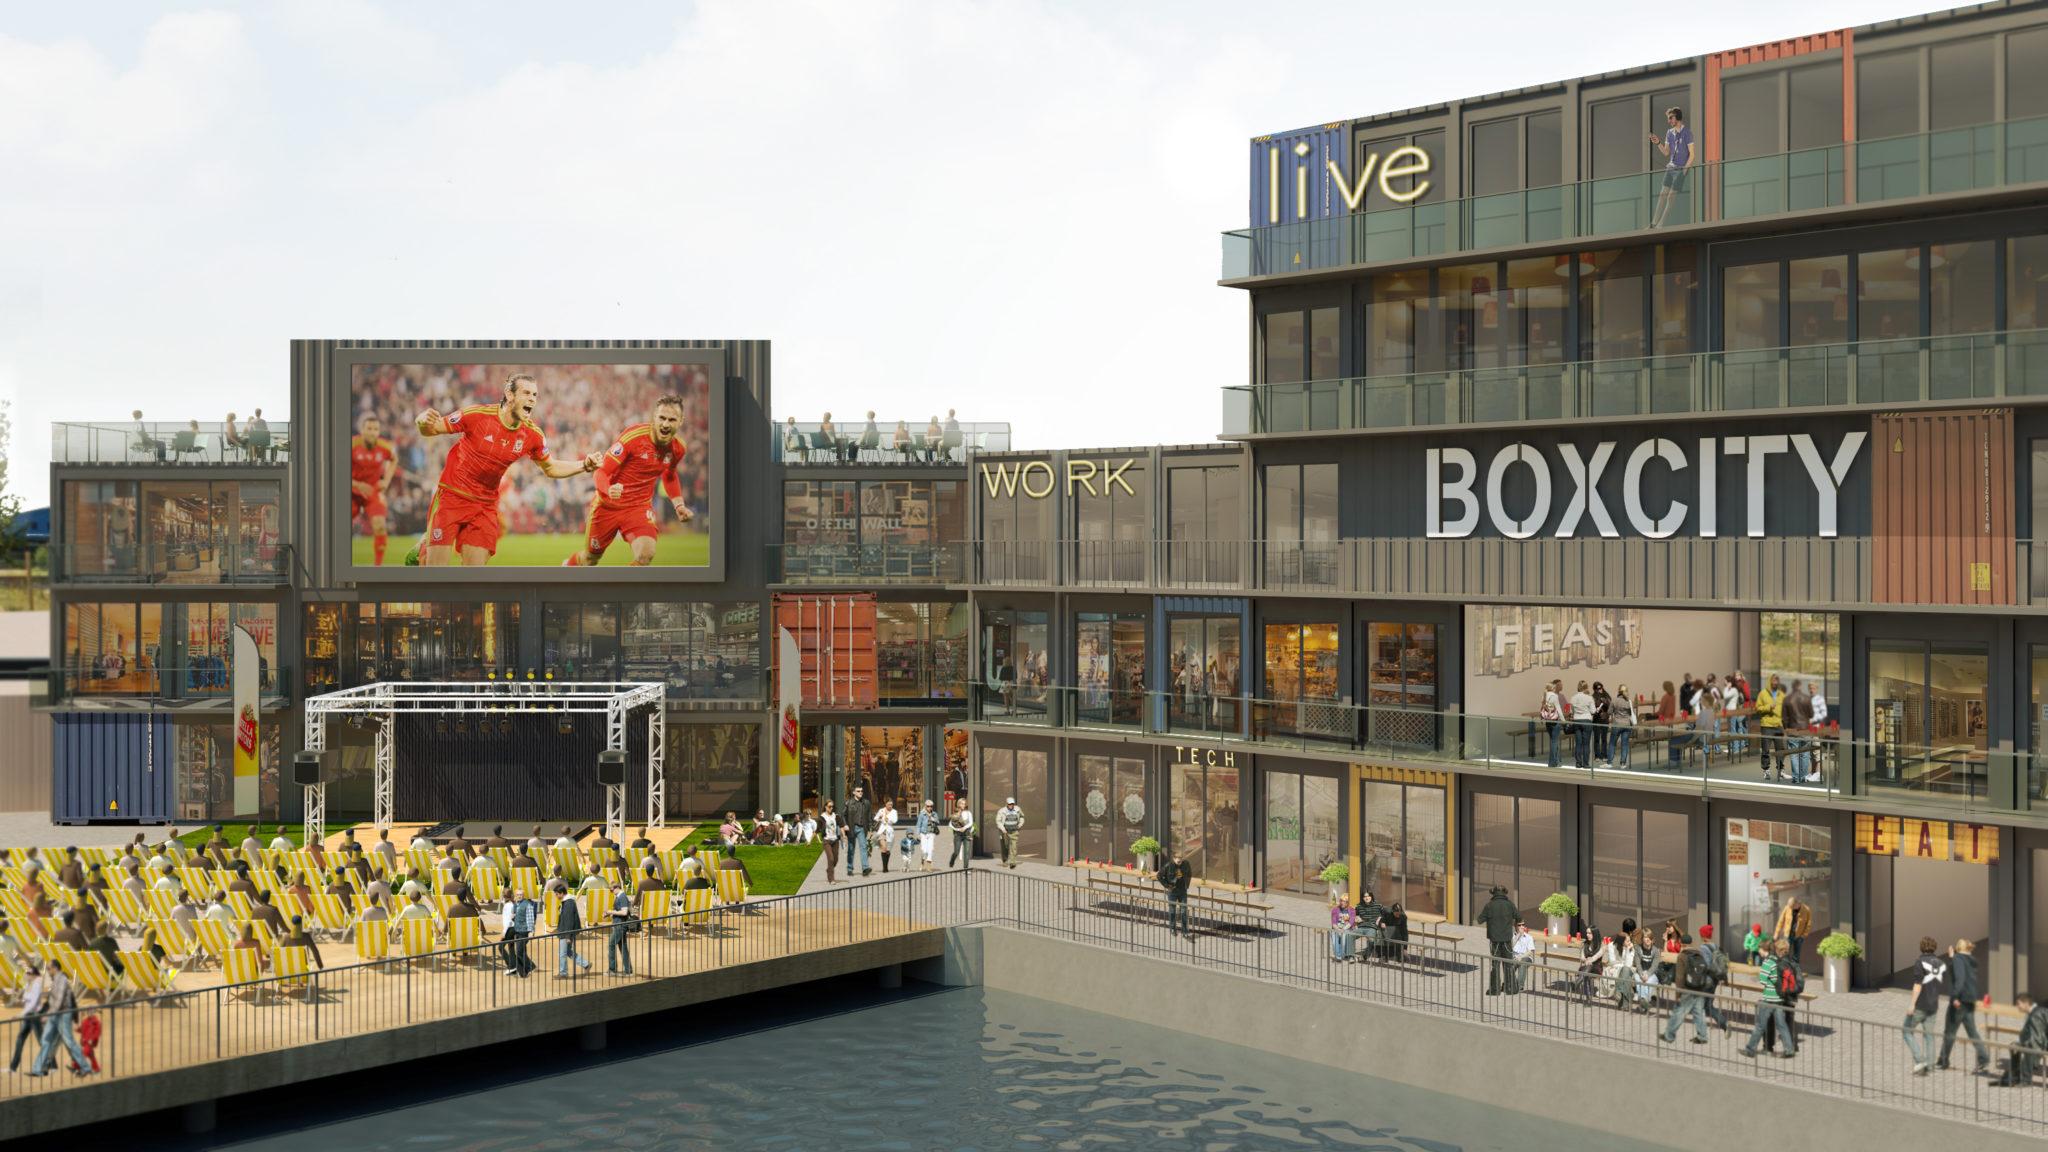 Boxcity Cardiff